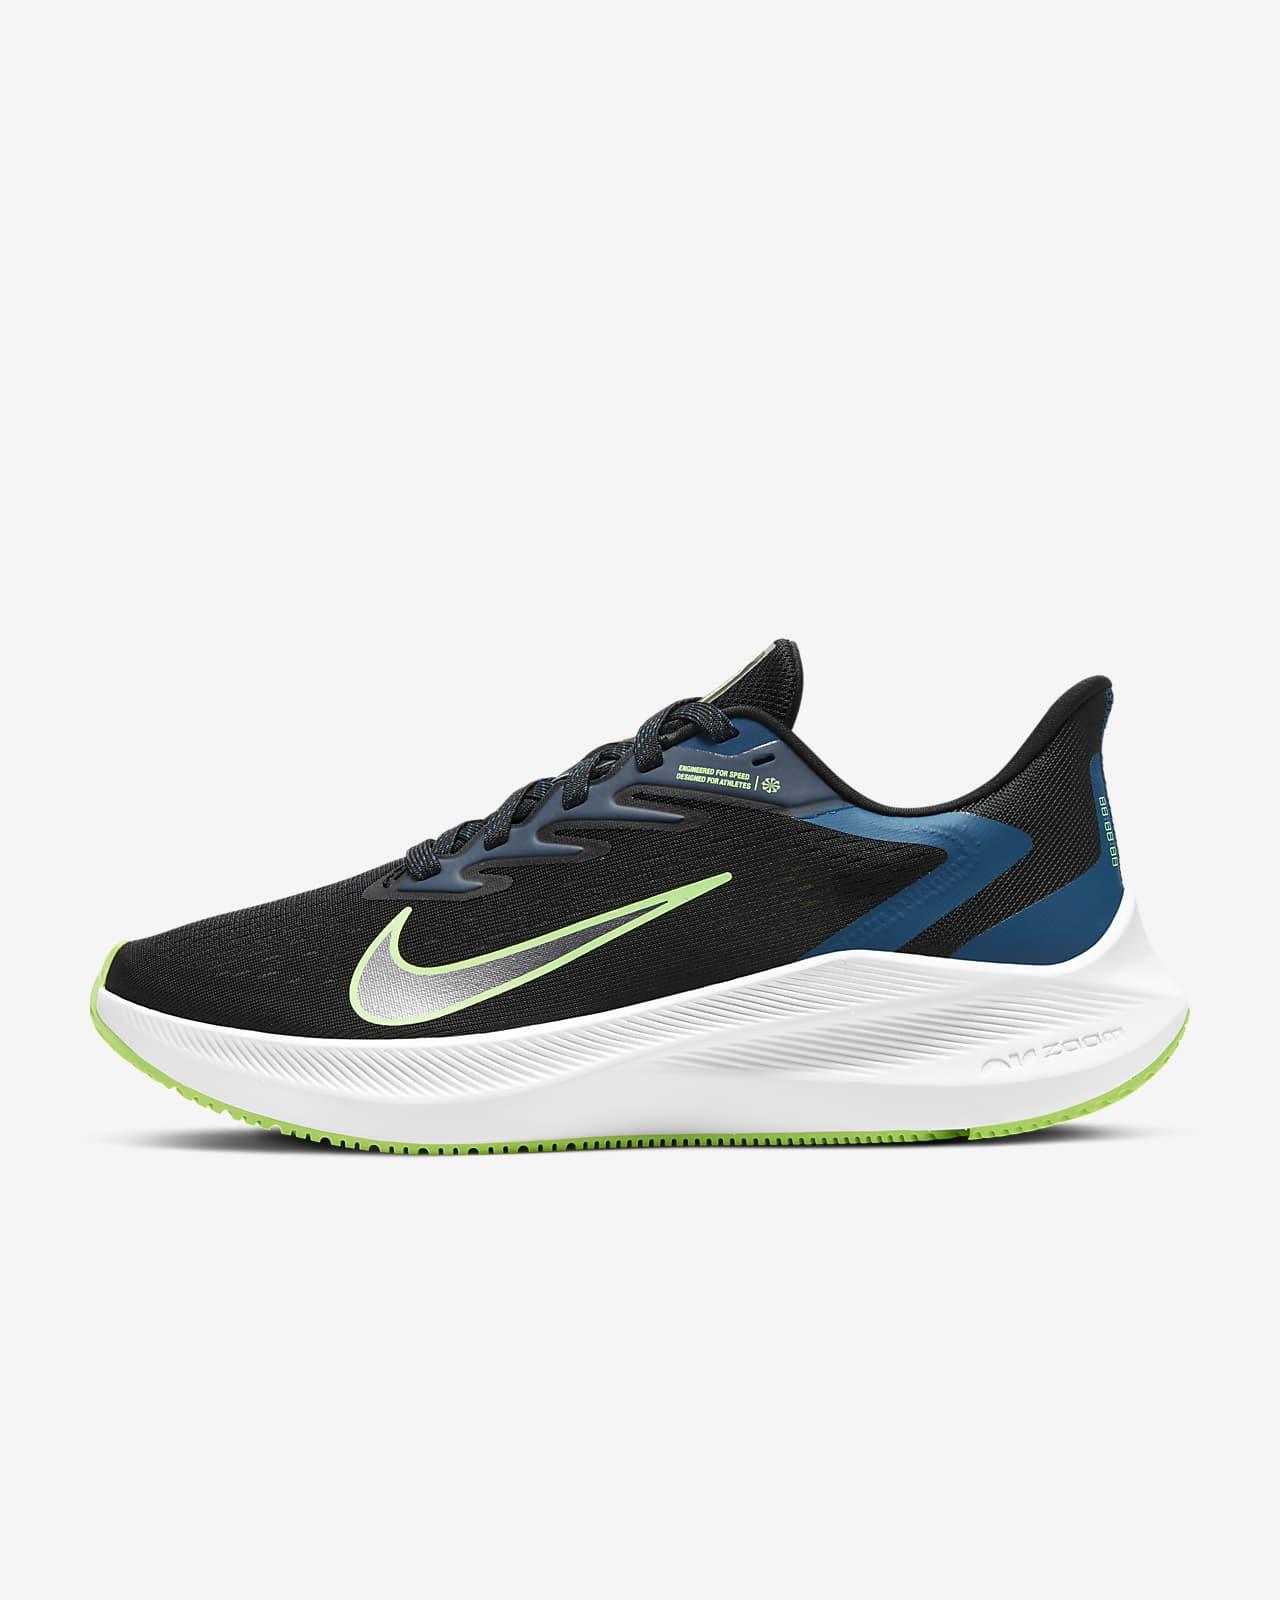 perfume jaula De acuerdo con  Nike Air Zoom Winflo 7 Women's Running Shoe. Nike LU